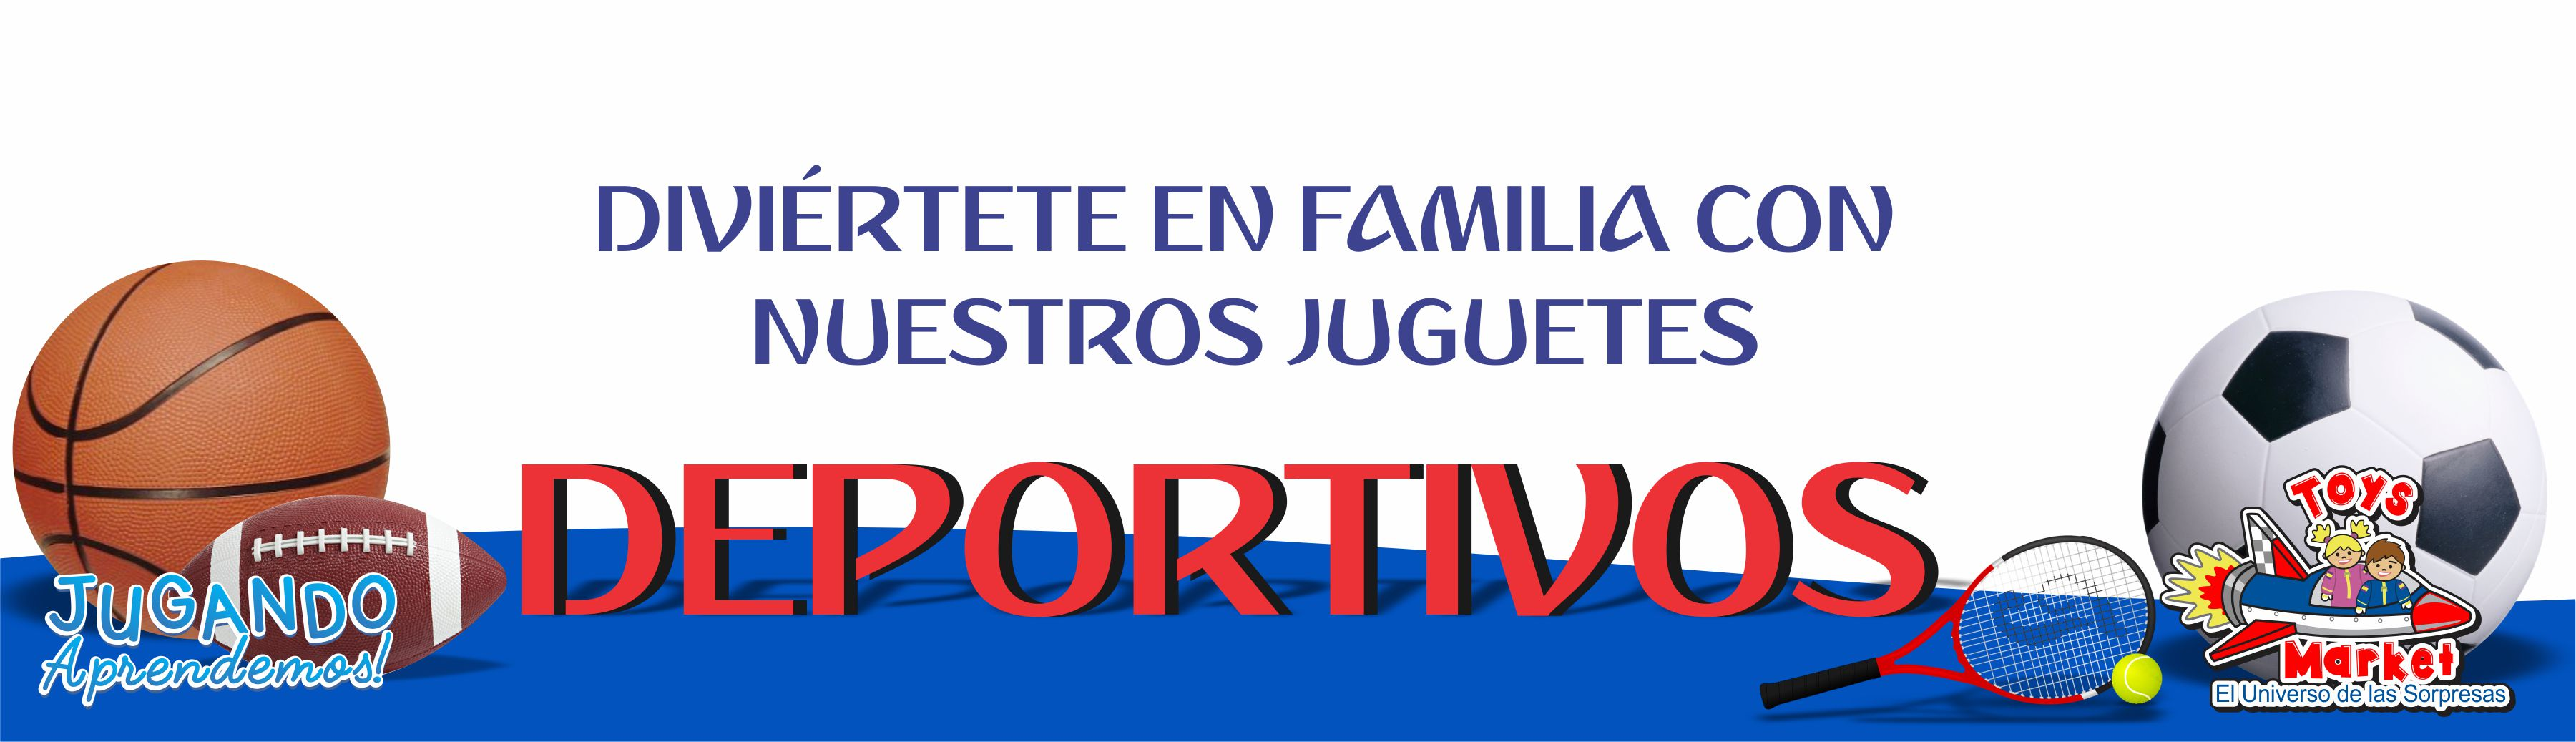 banner DEPORTIVOS 1